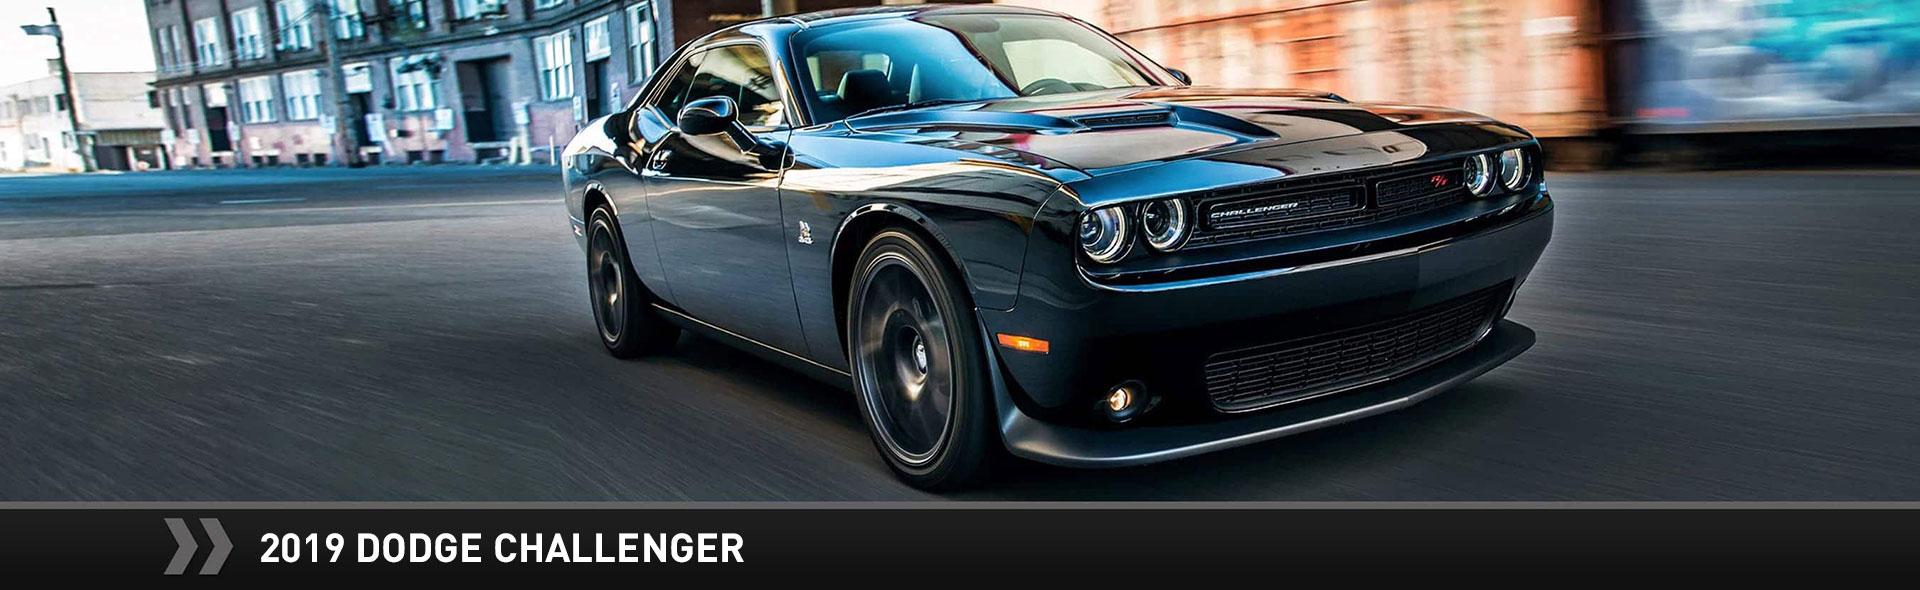 2019 Dodge Challenger For sale | Barrie Chrysler